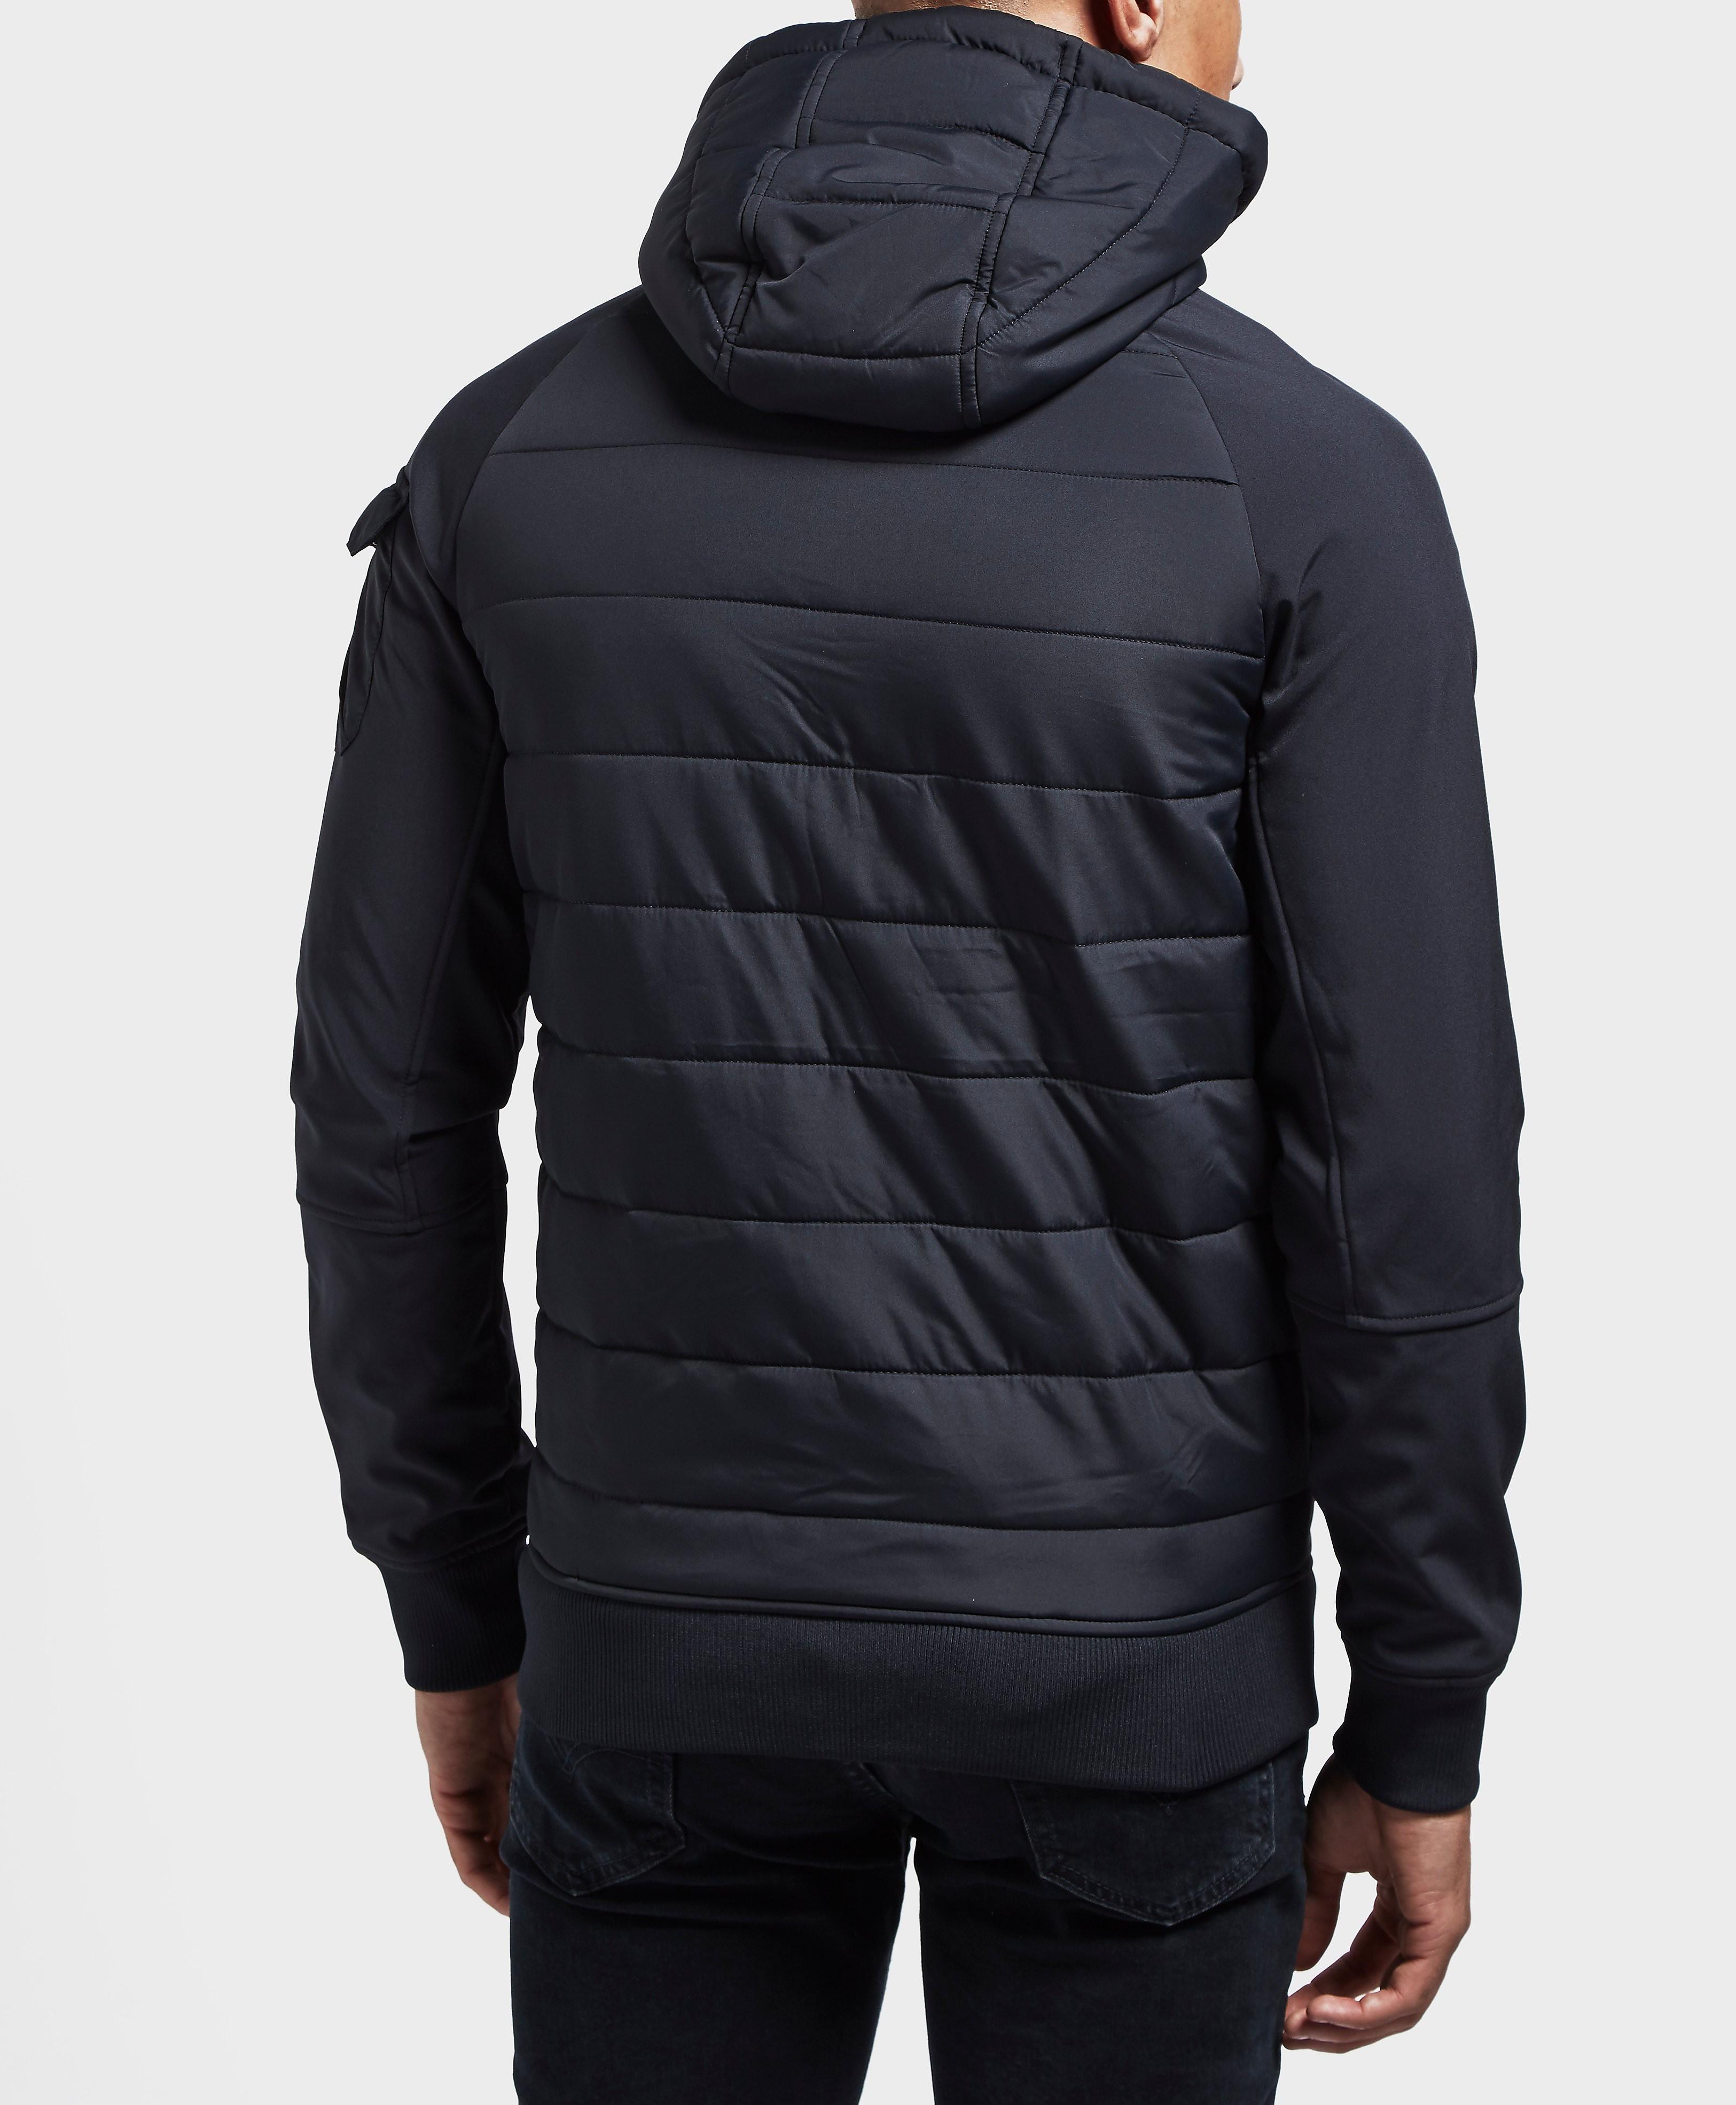 One True Saxon Decreed Fleece Jacket - Exclusive